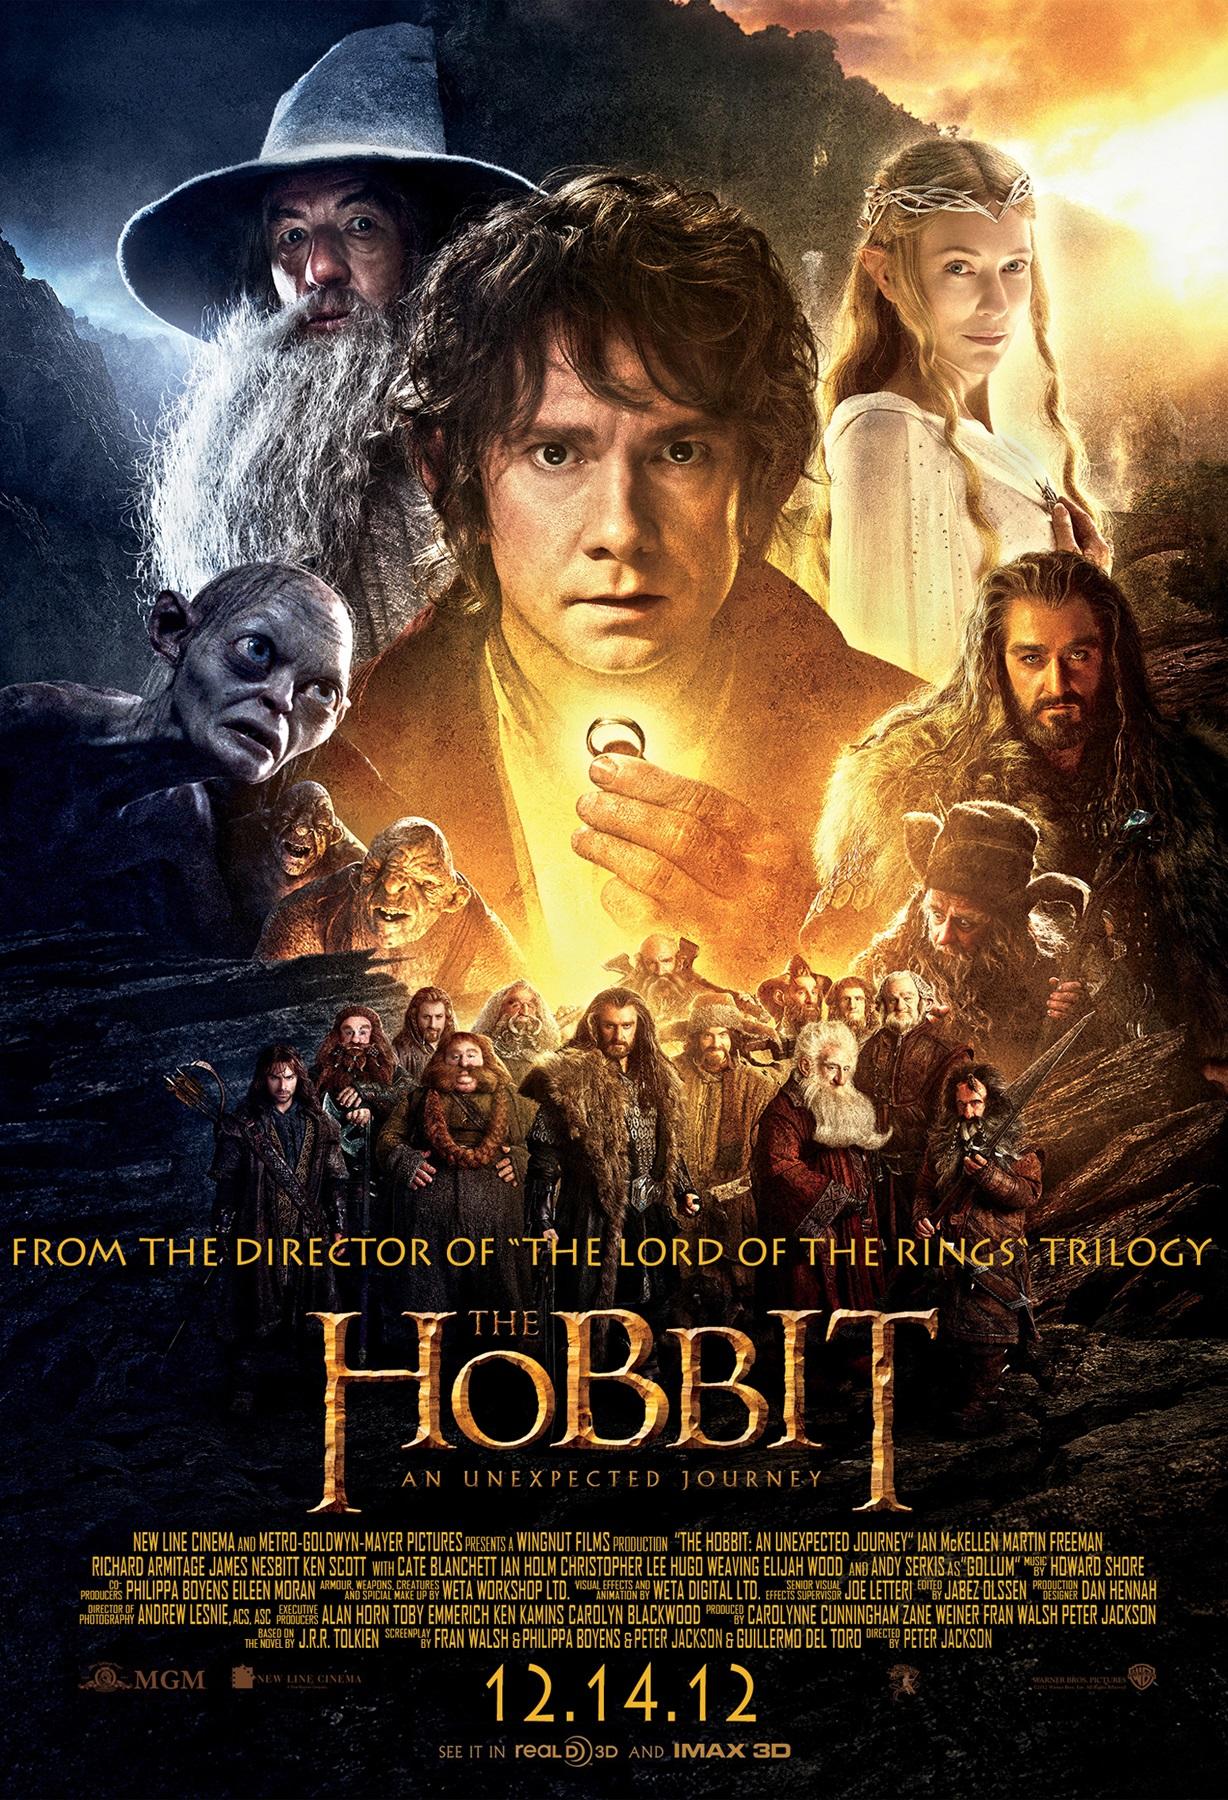 hobbit niezwykła podróż film recenzja plakat martin freeman